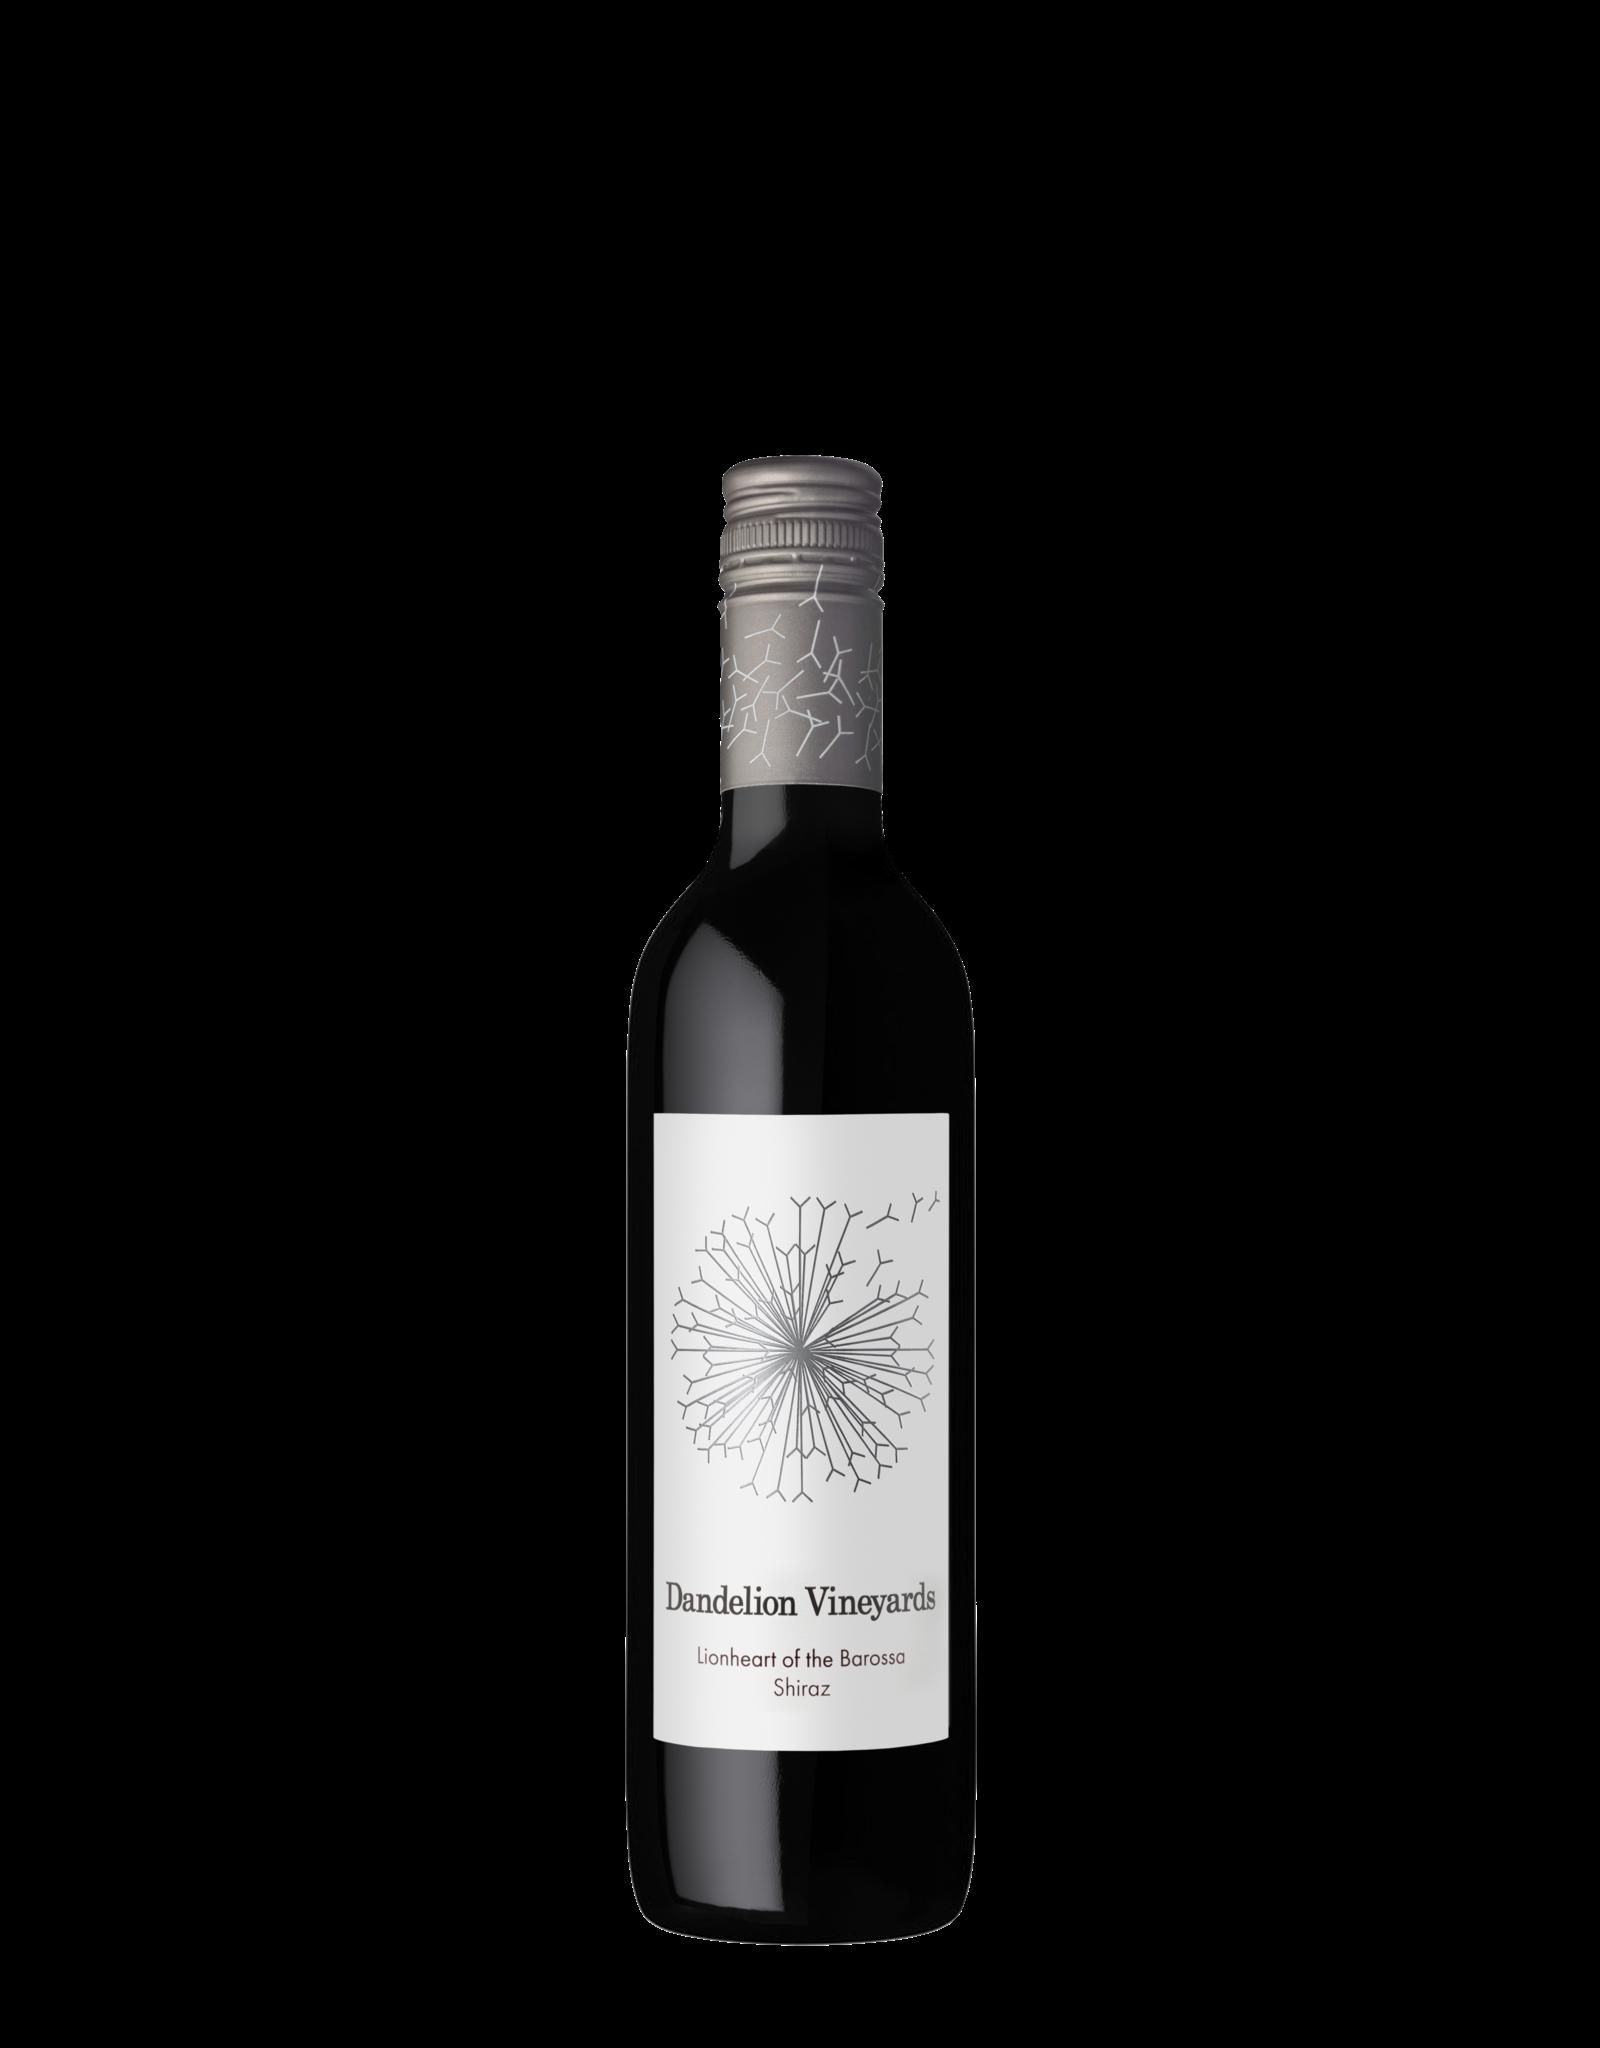 Dandelion Vineyards 'Lionheart' Shiraz